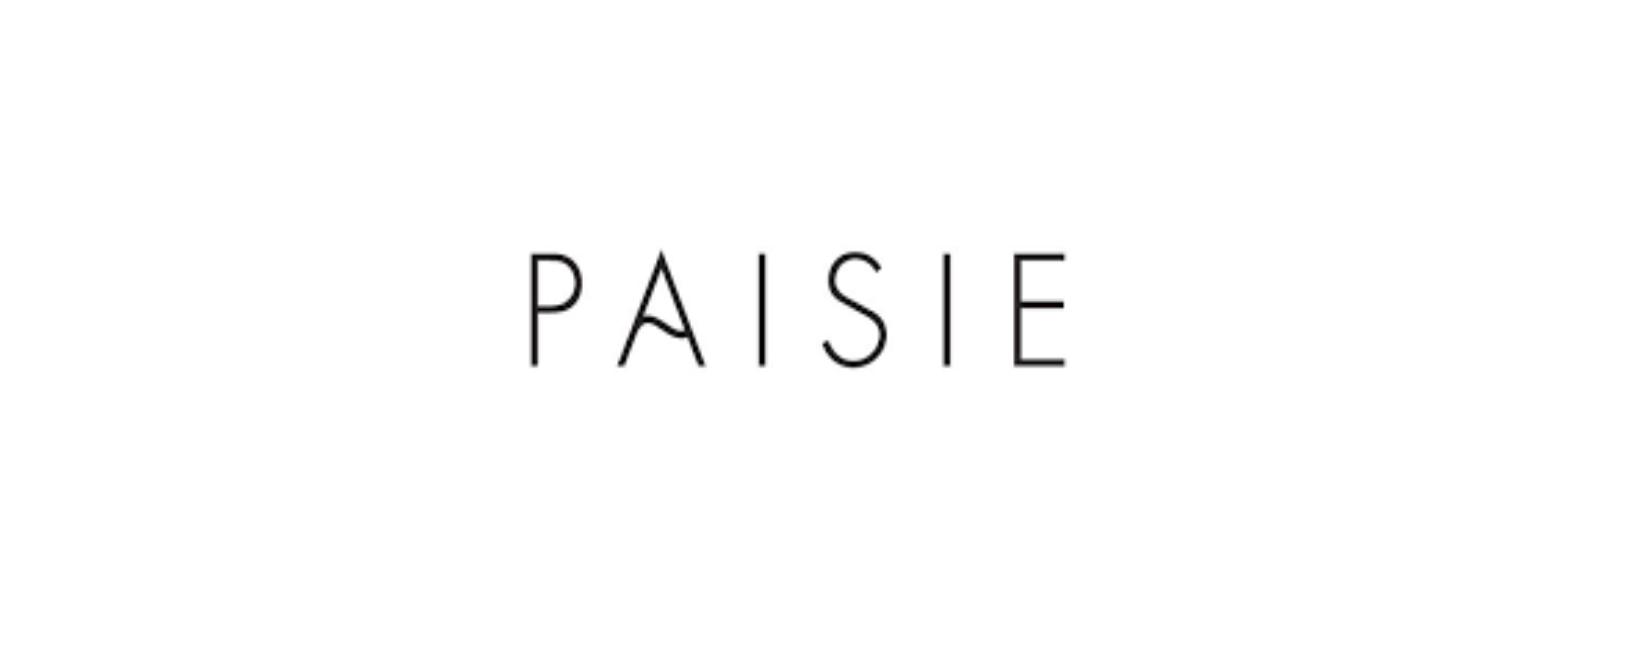 Paisie UK Discount Code 2021